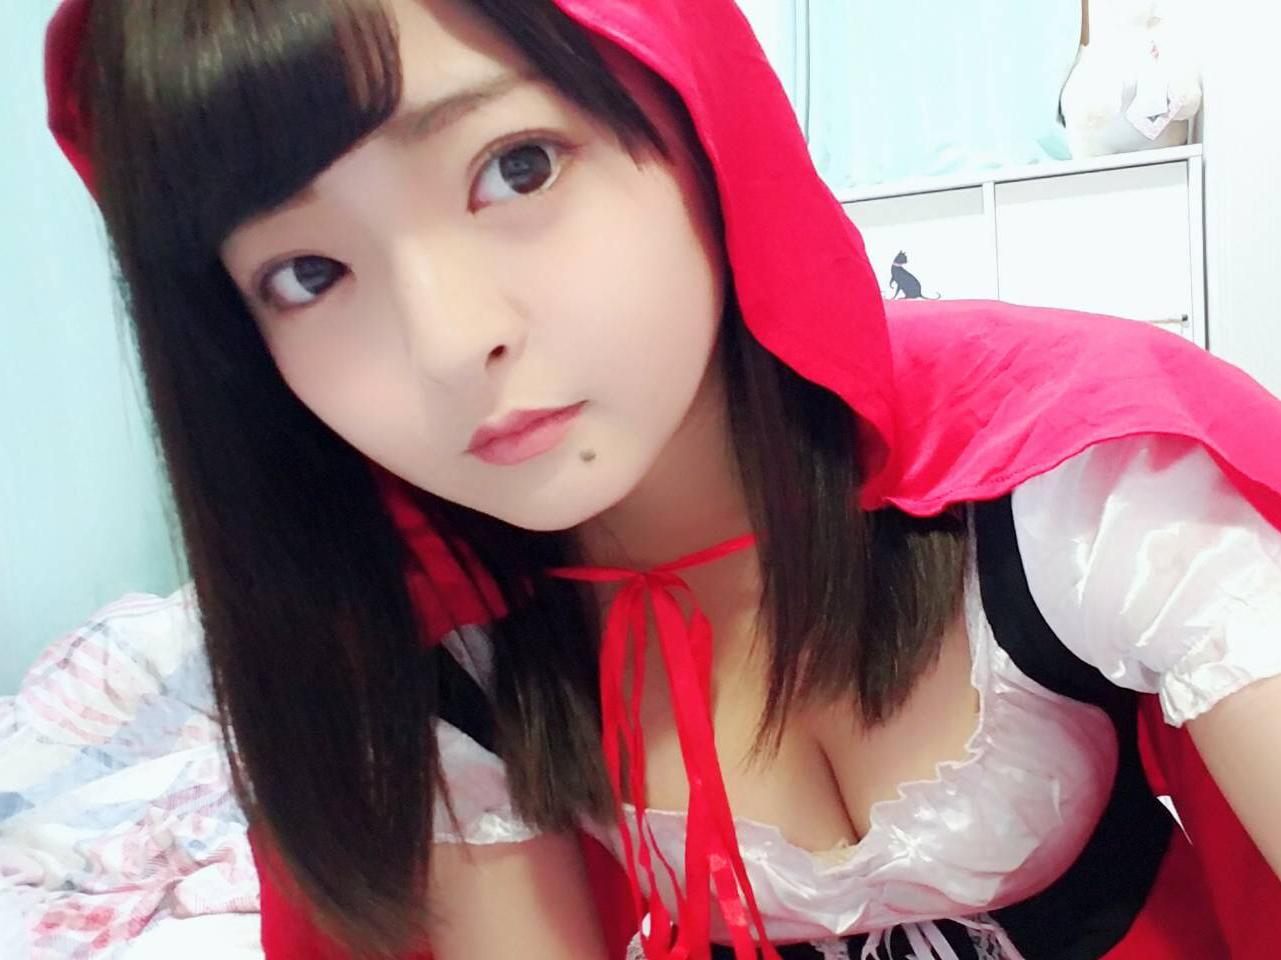 YUNtwc - Japanese webcam girl